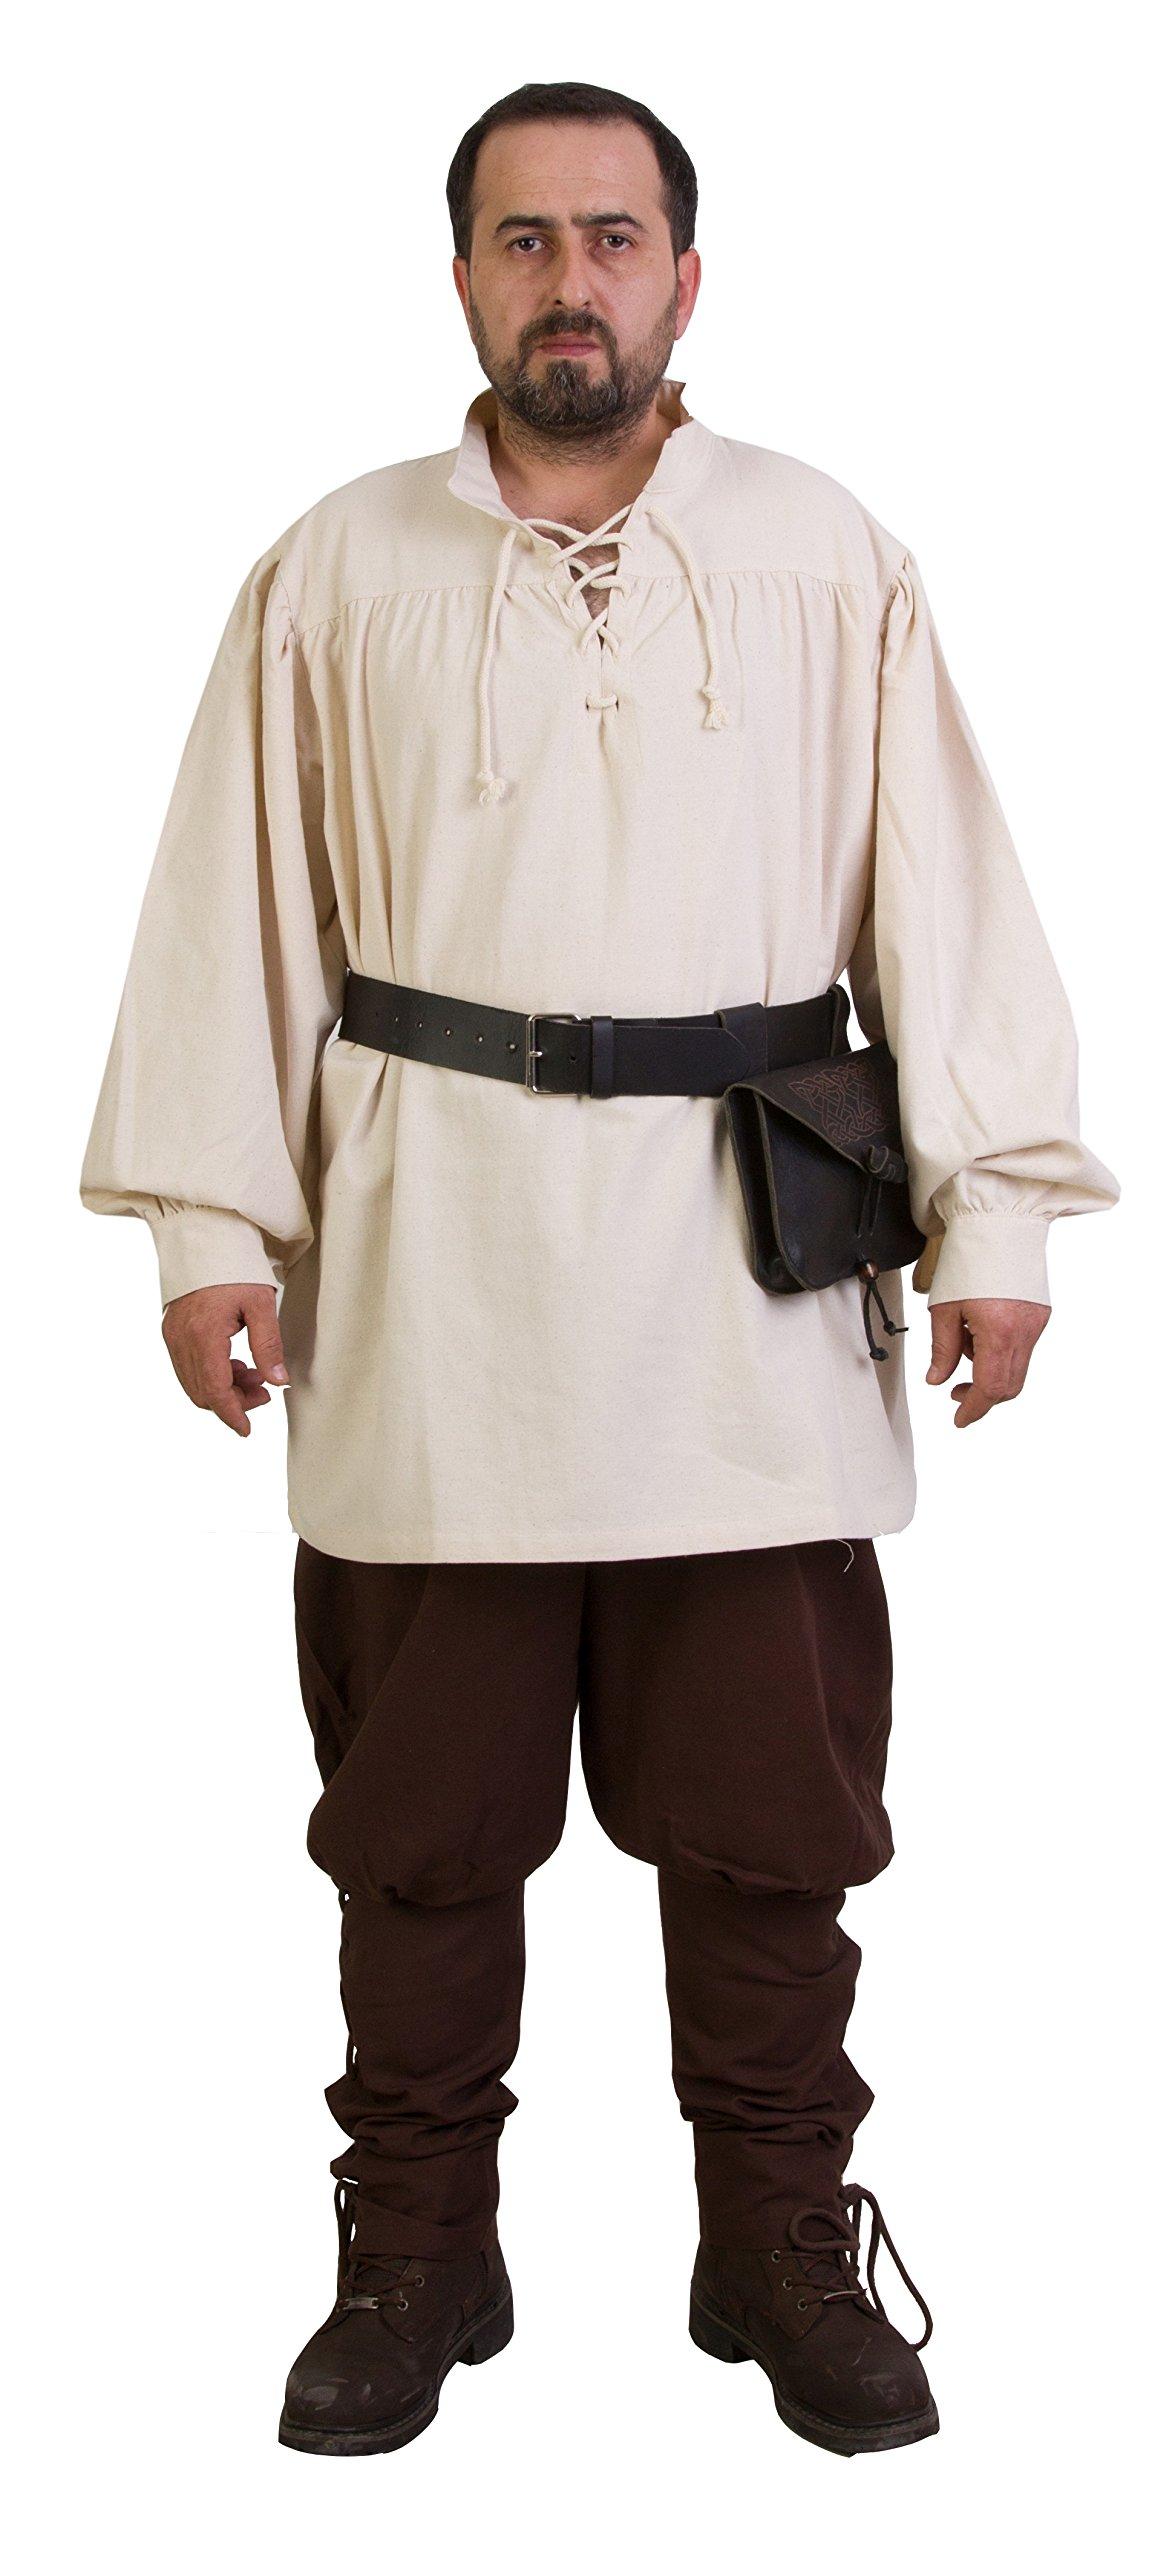 byCalvina - Calvina Costumes ERMES Medieval Viking LARP Pirate Cotton Man Shirt - Made in Turkey-Nat-2XL by byCalvina - Calvina Costumes (Image #2)